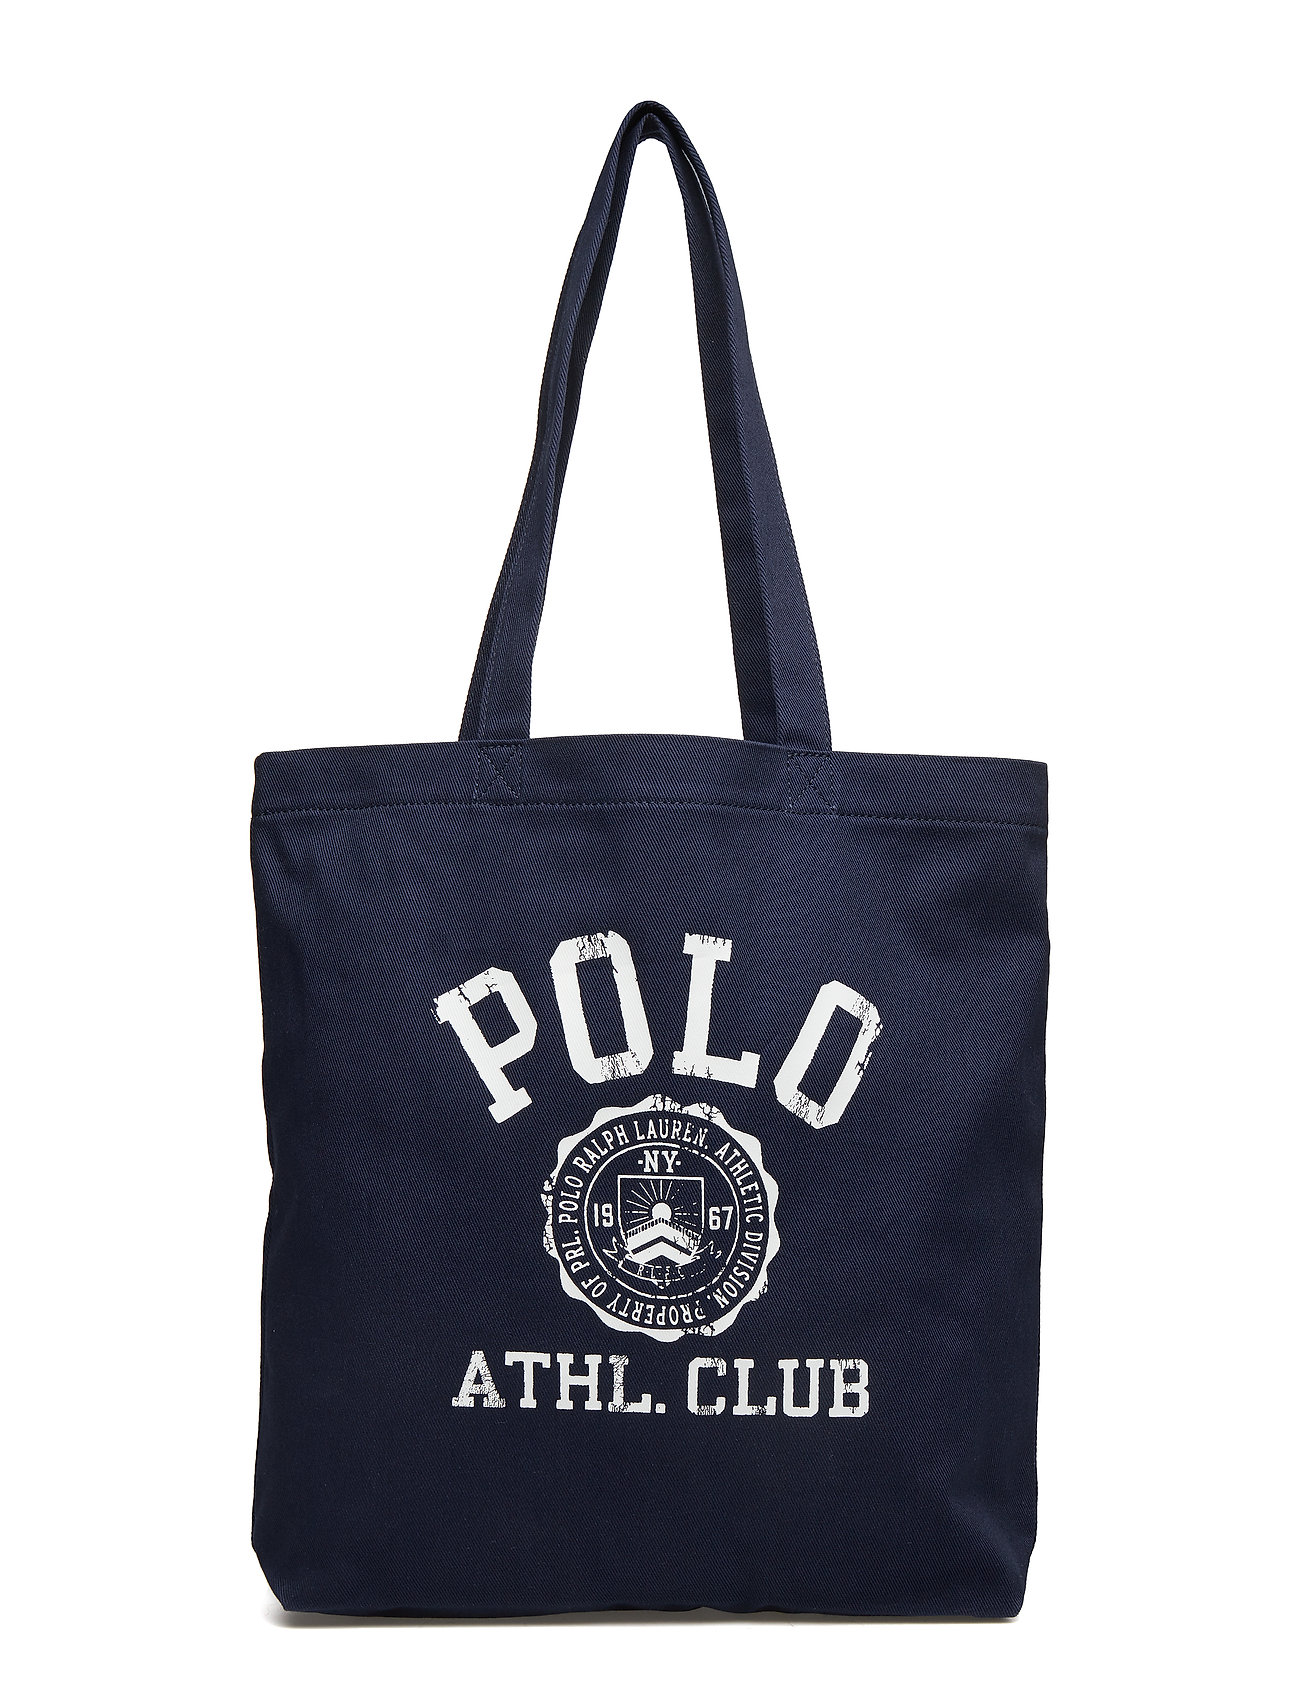 7dcae5d87e Polo Athletic Club Tote (Navy) (224.25 €) - Polo Ralph Lauren ...